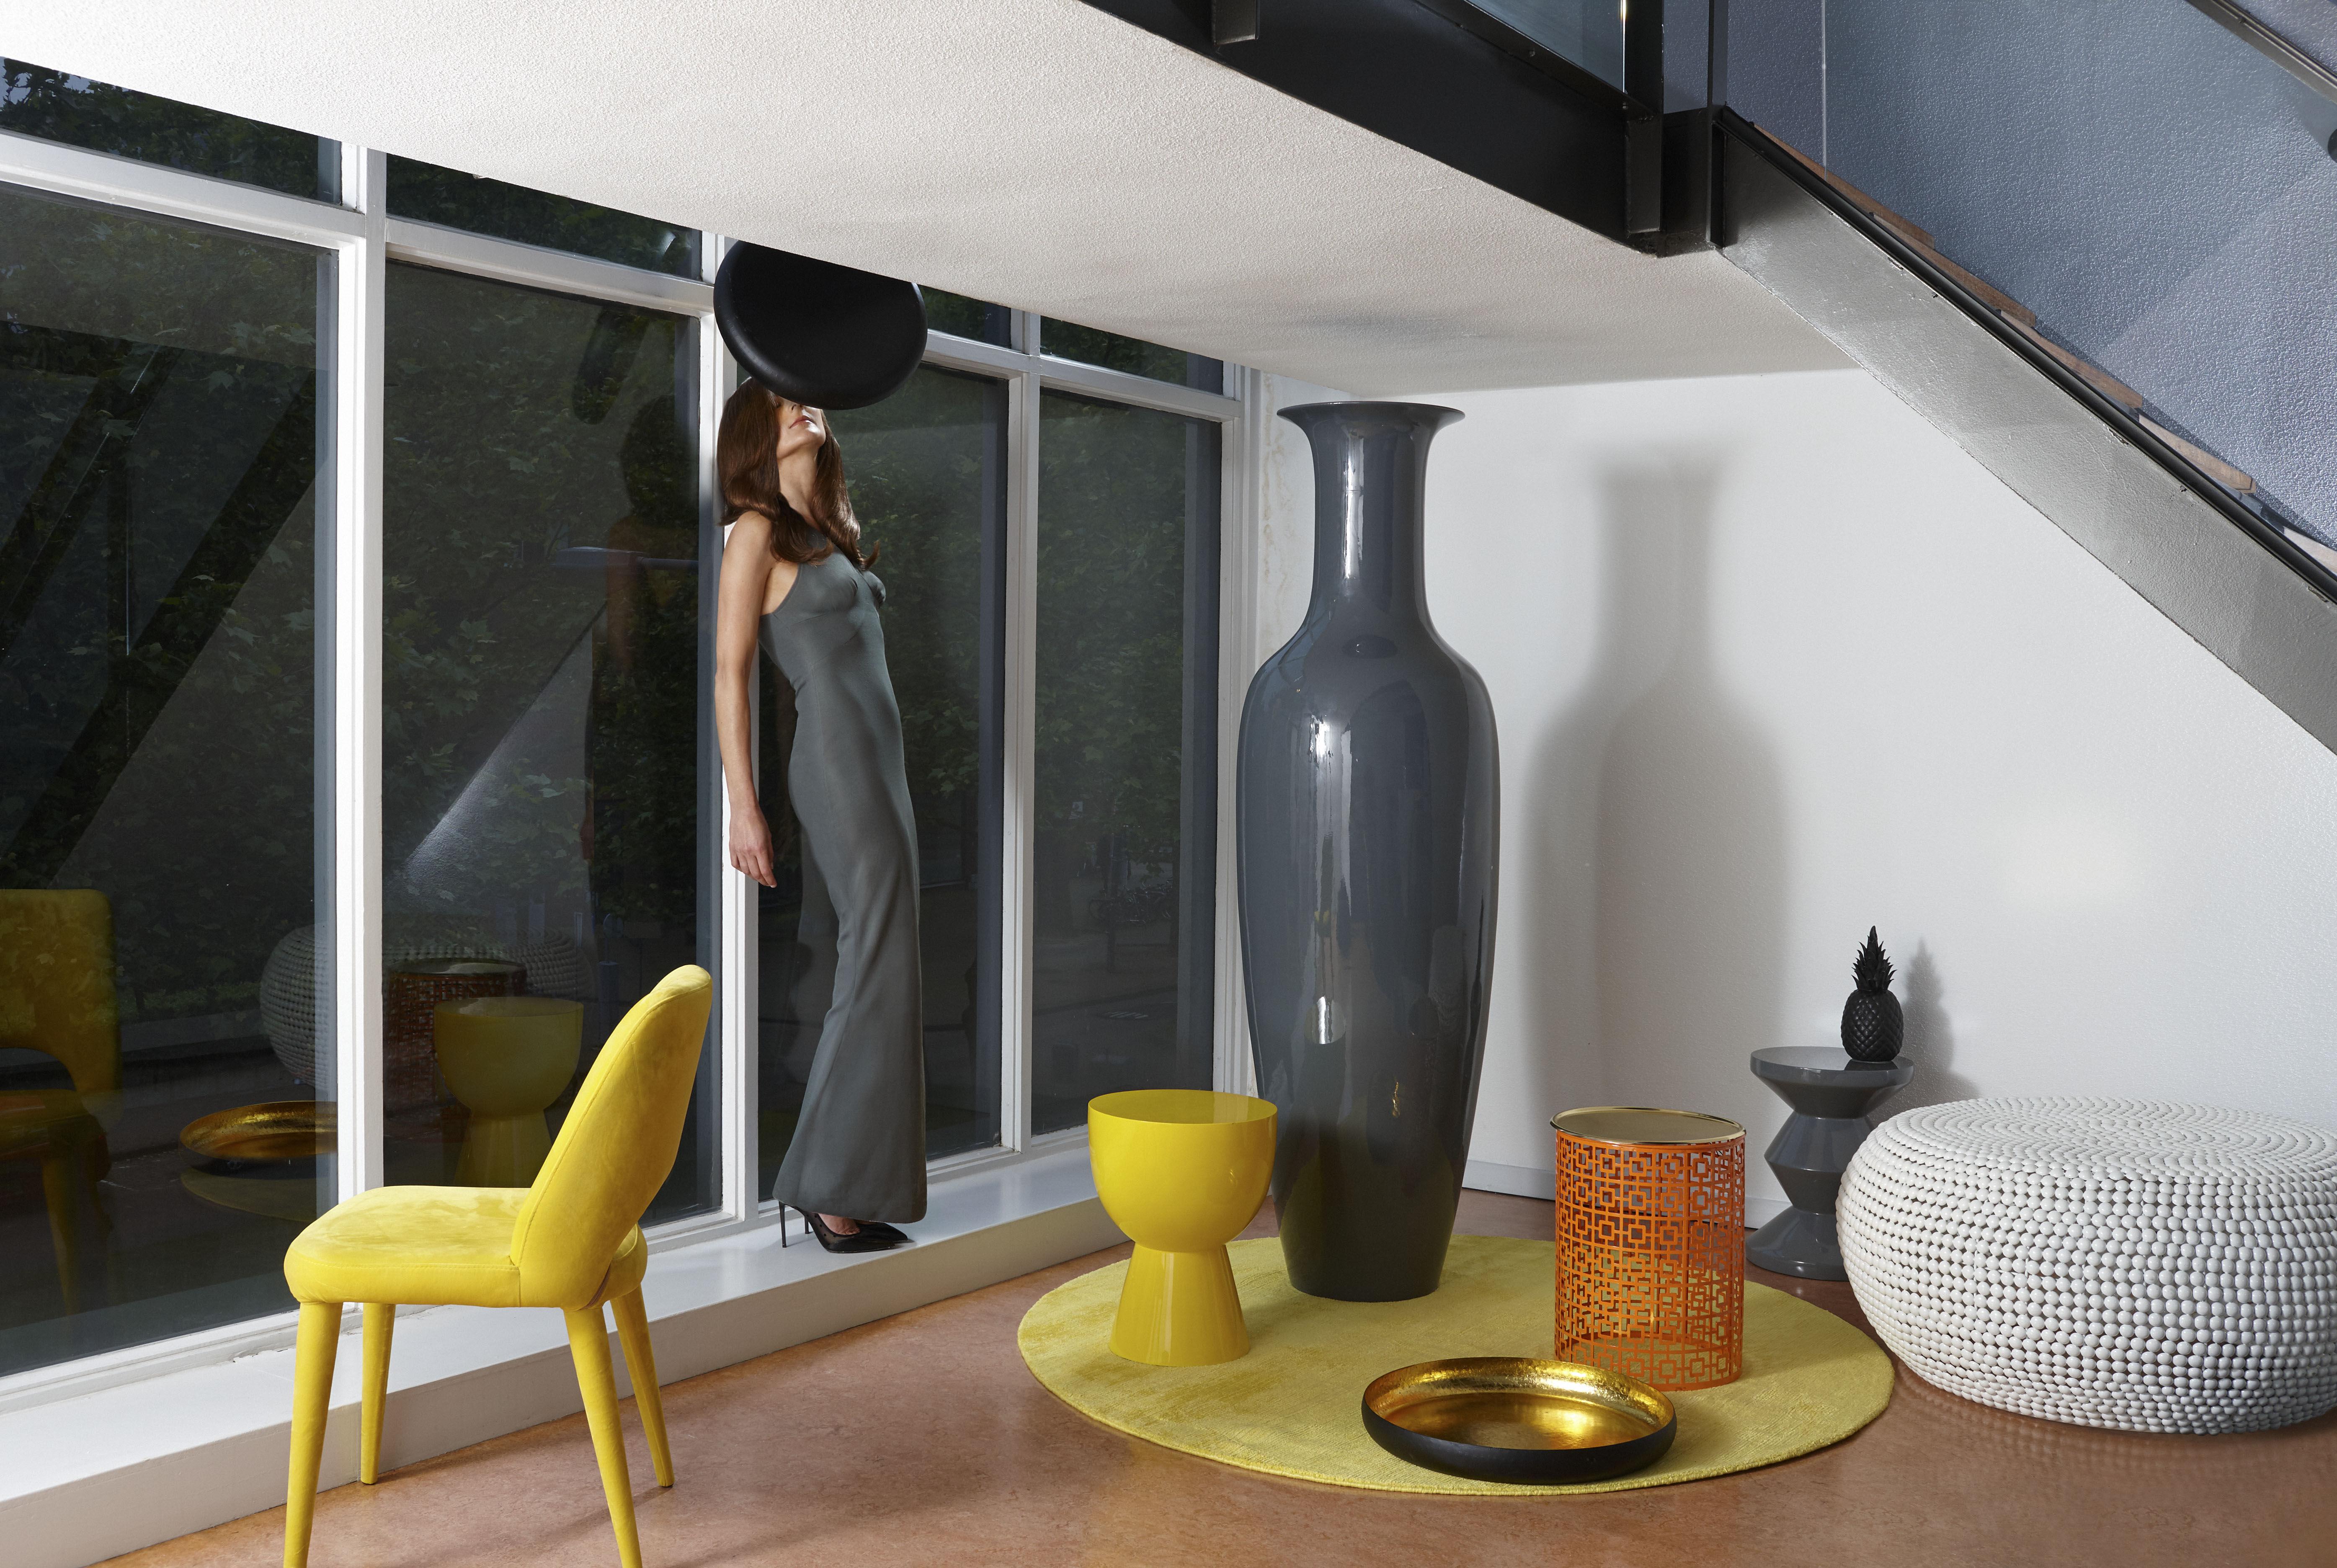 Sedia Imbottita Design : Holy sedia imbottita velluto by pols potten made in design